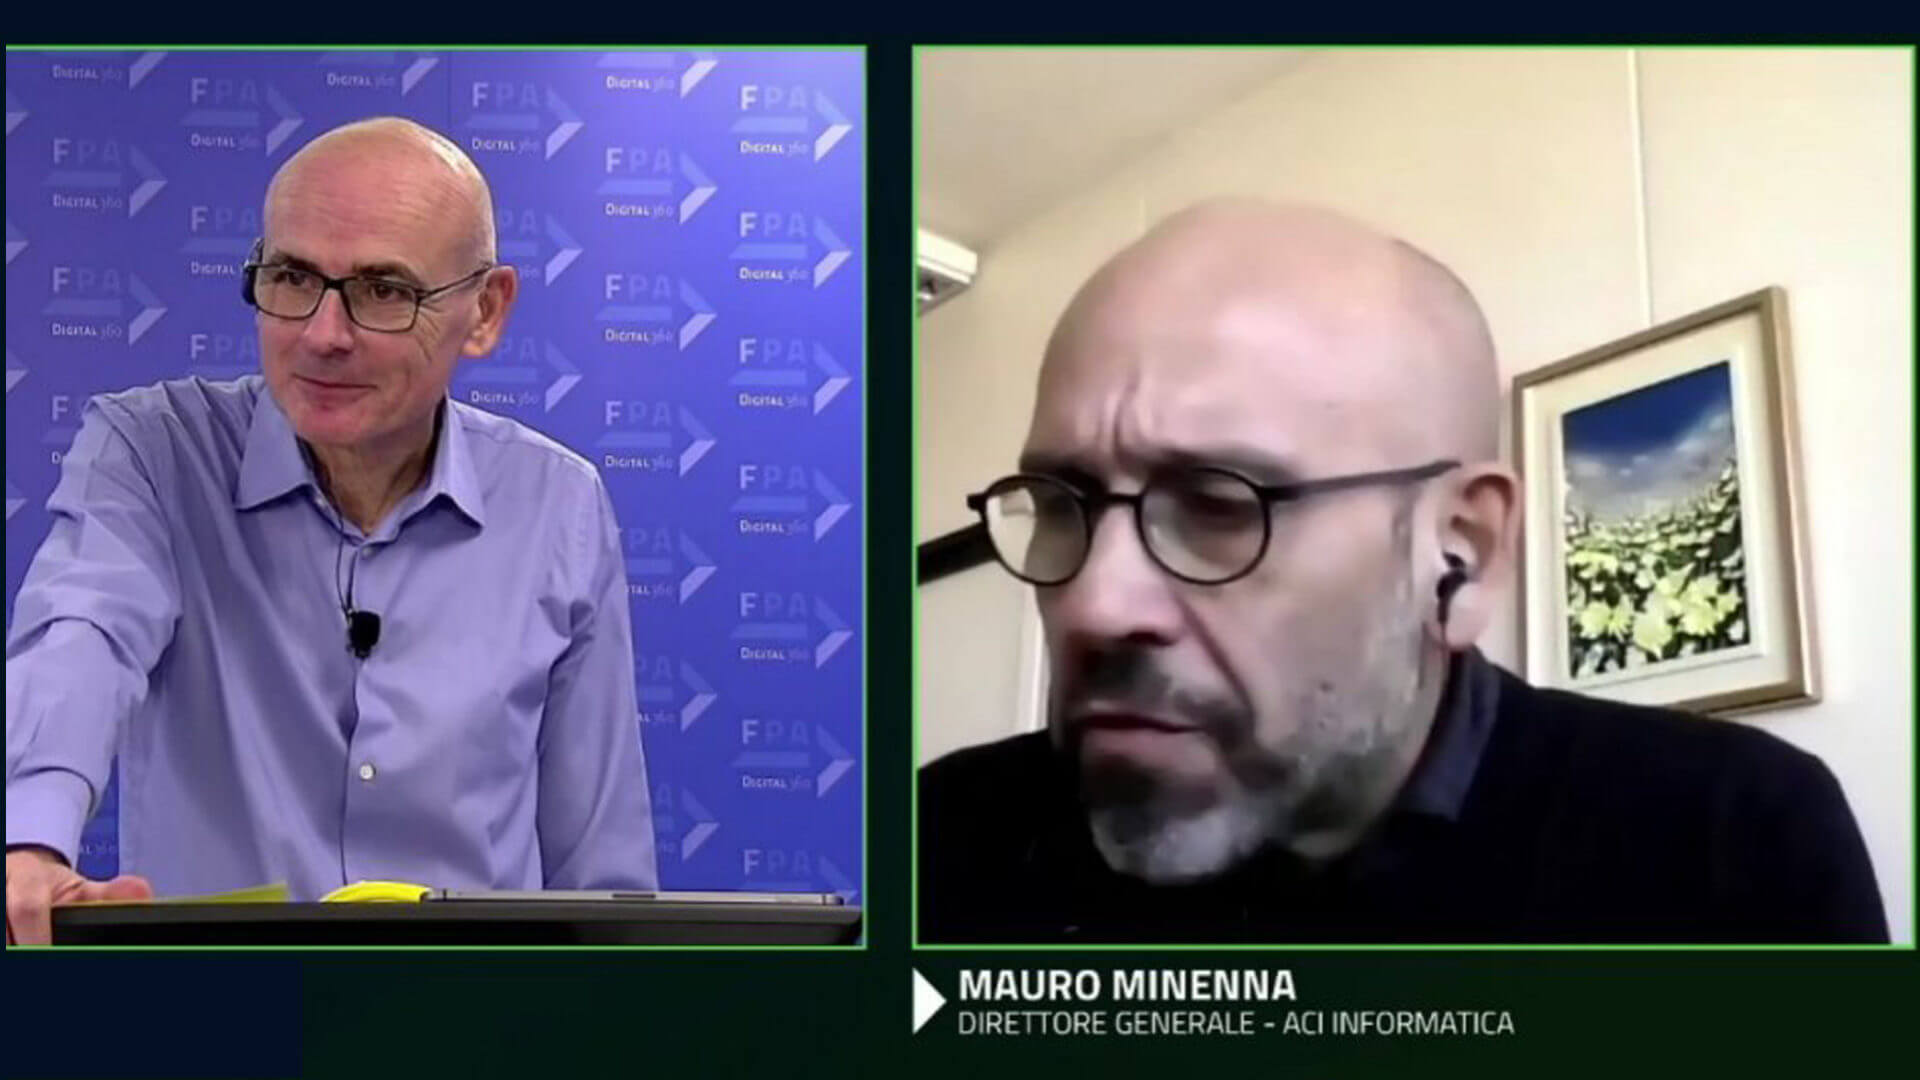 Mauro Minenna